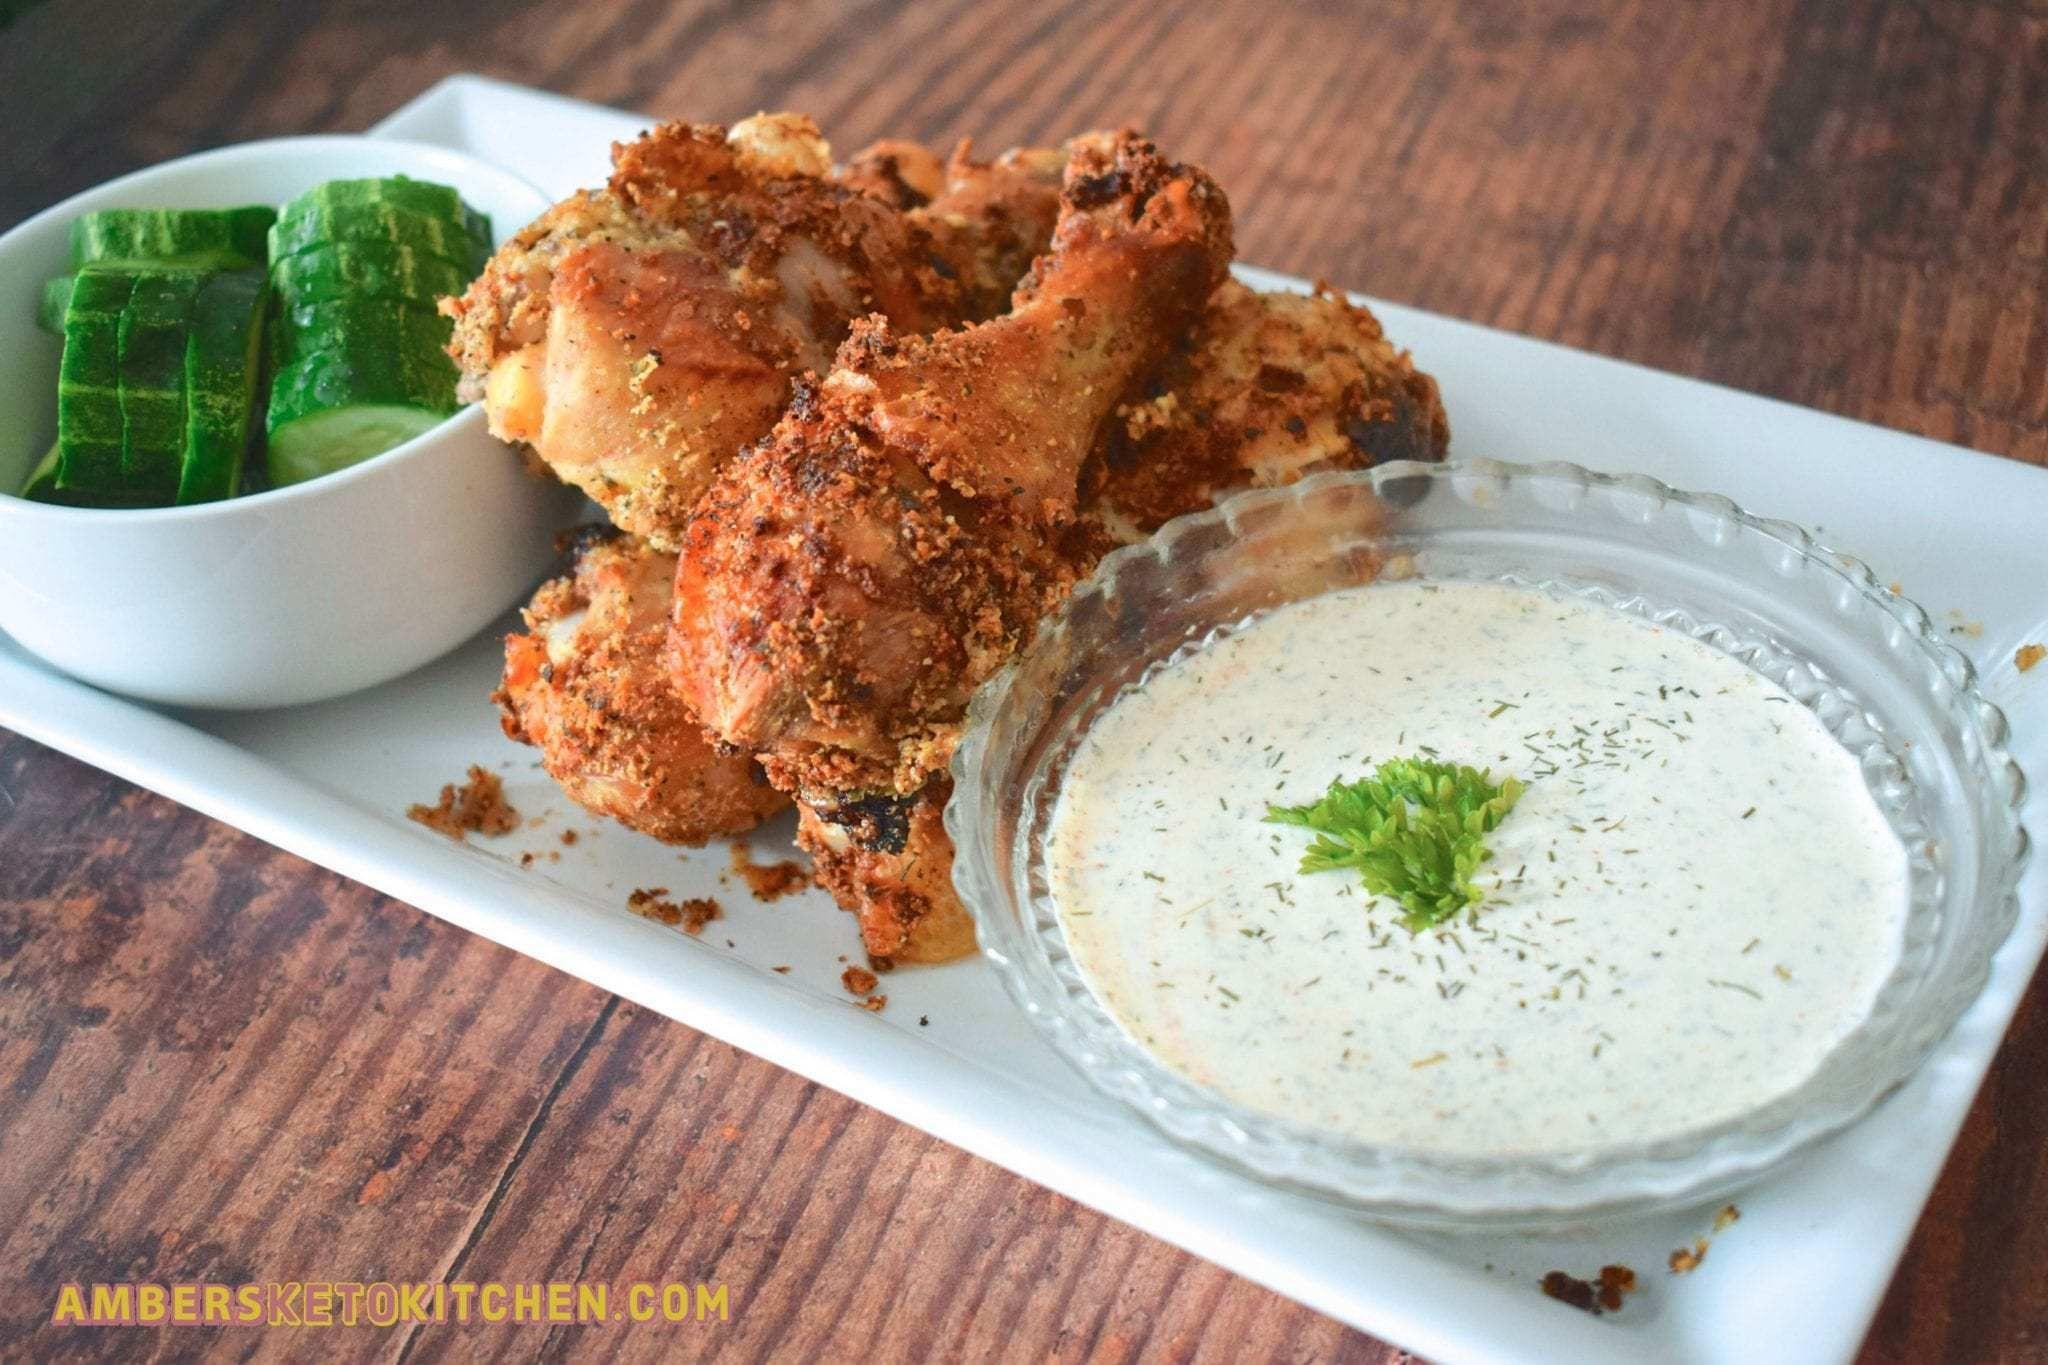 Keto Air Fryer Pickle Brined Fried Chicken Drumsticks with